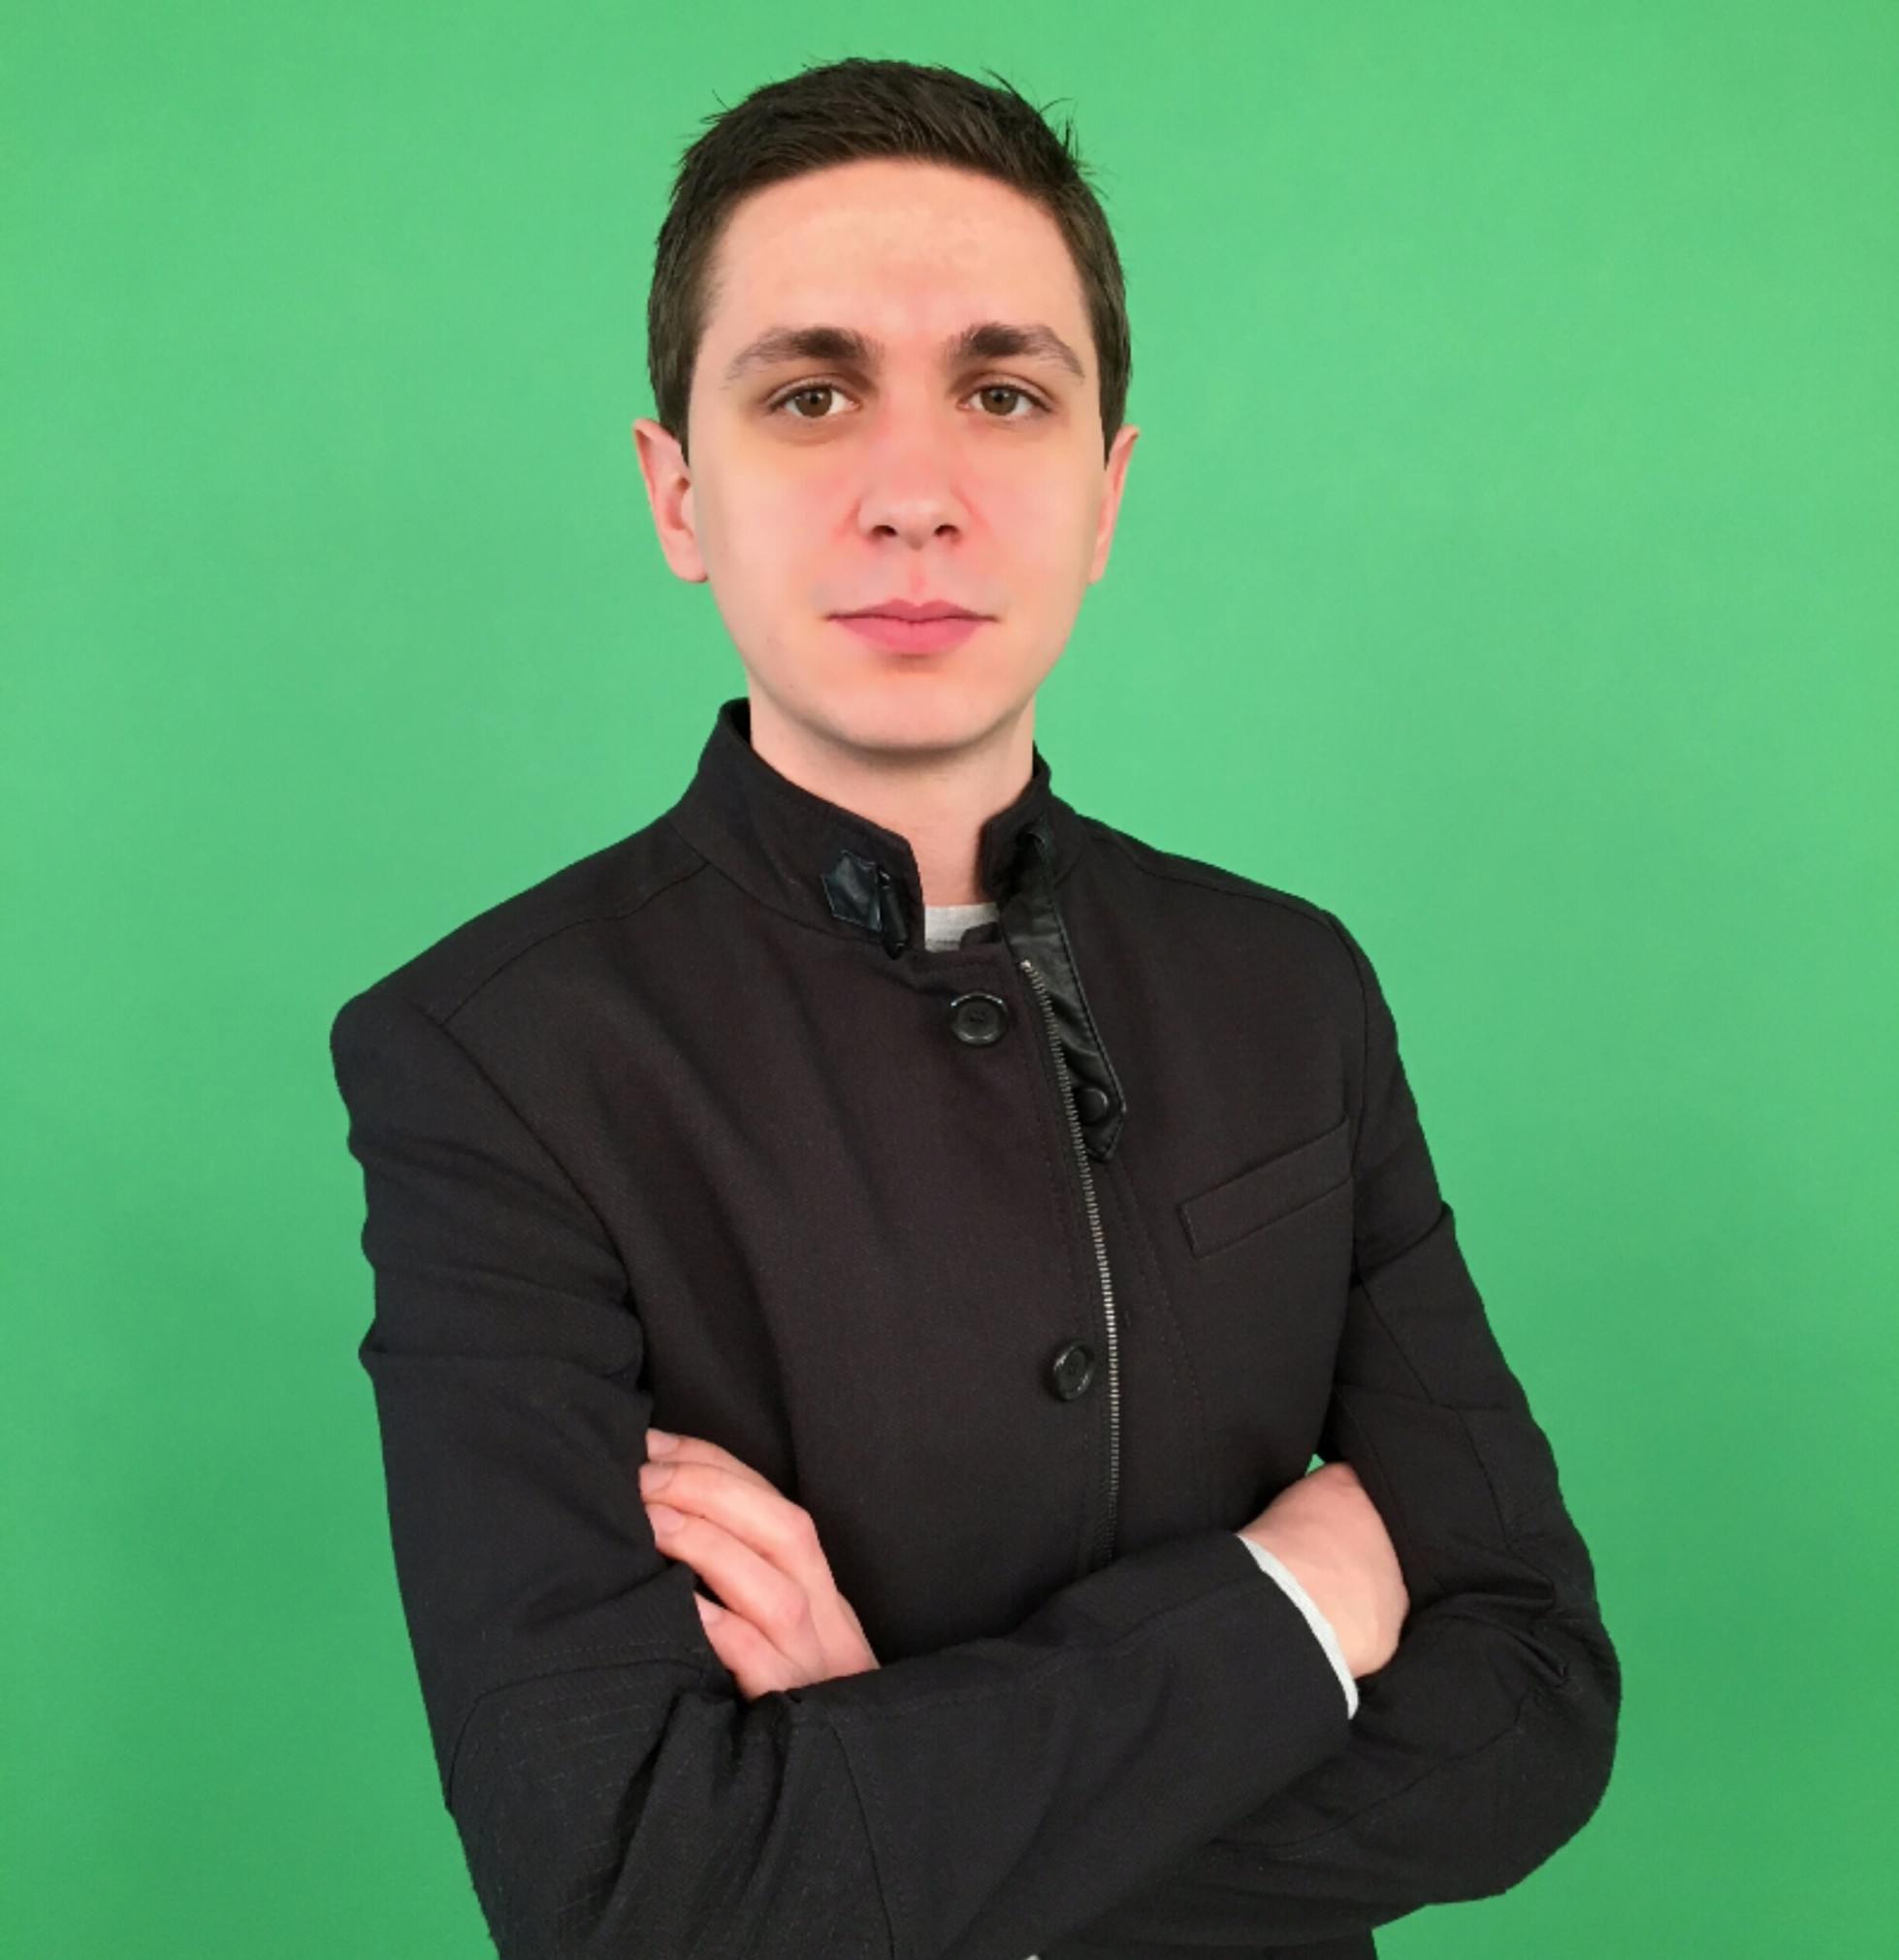 Mihai Catalin Teodosiu